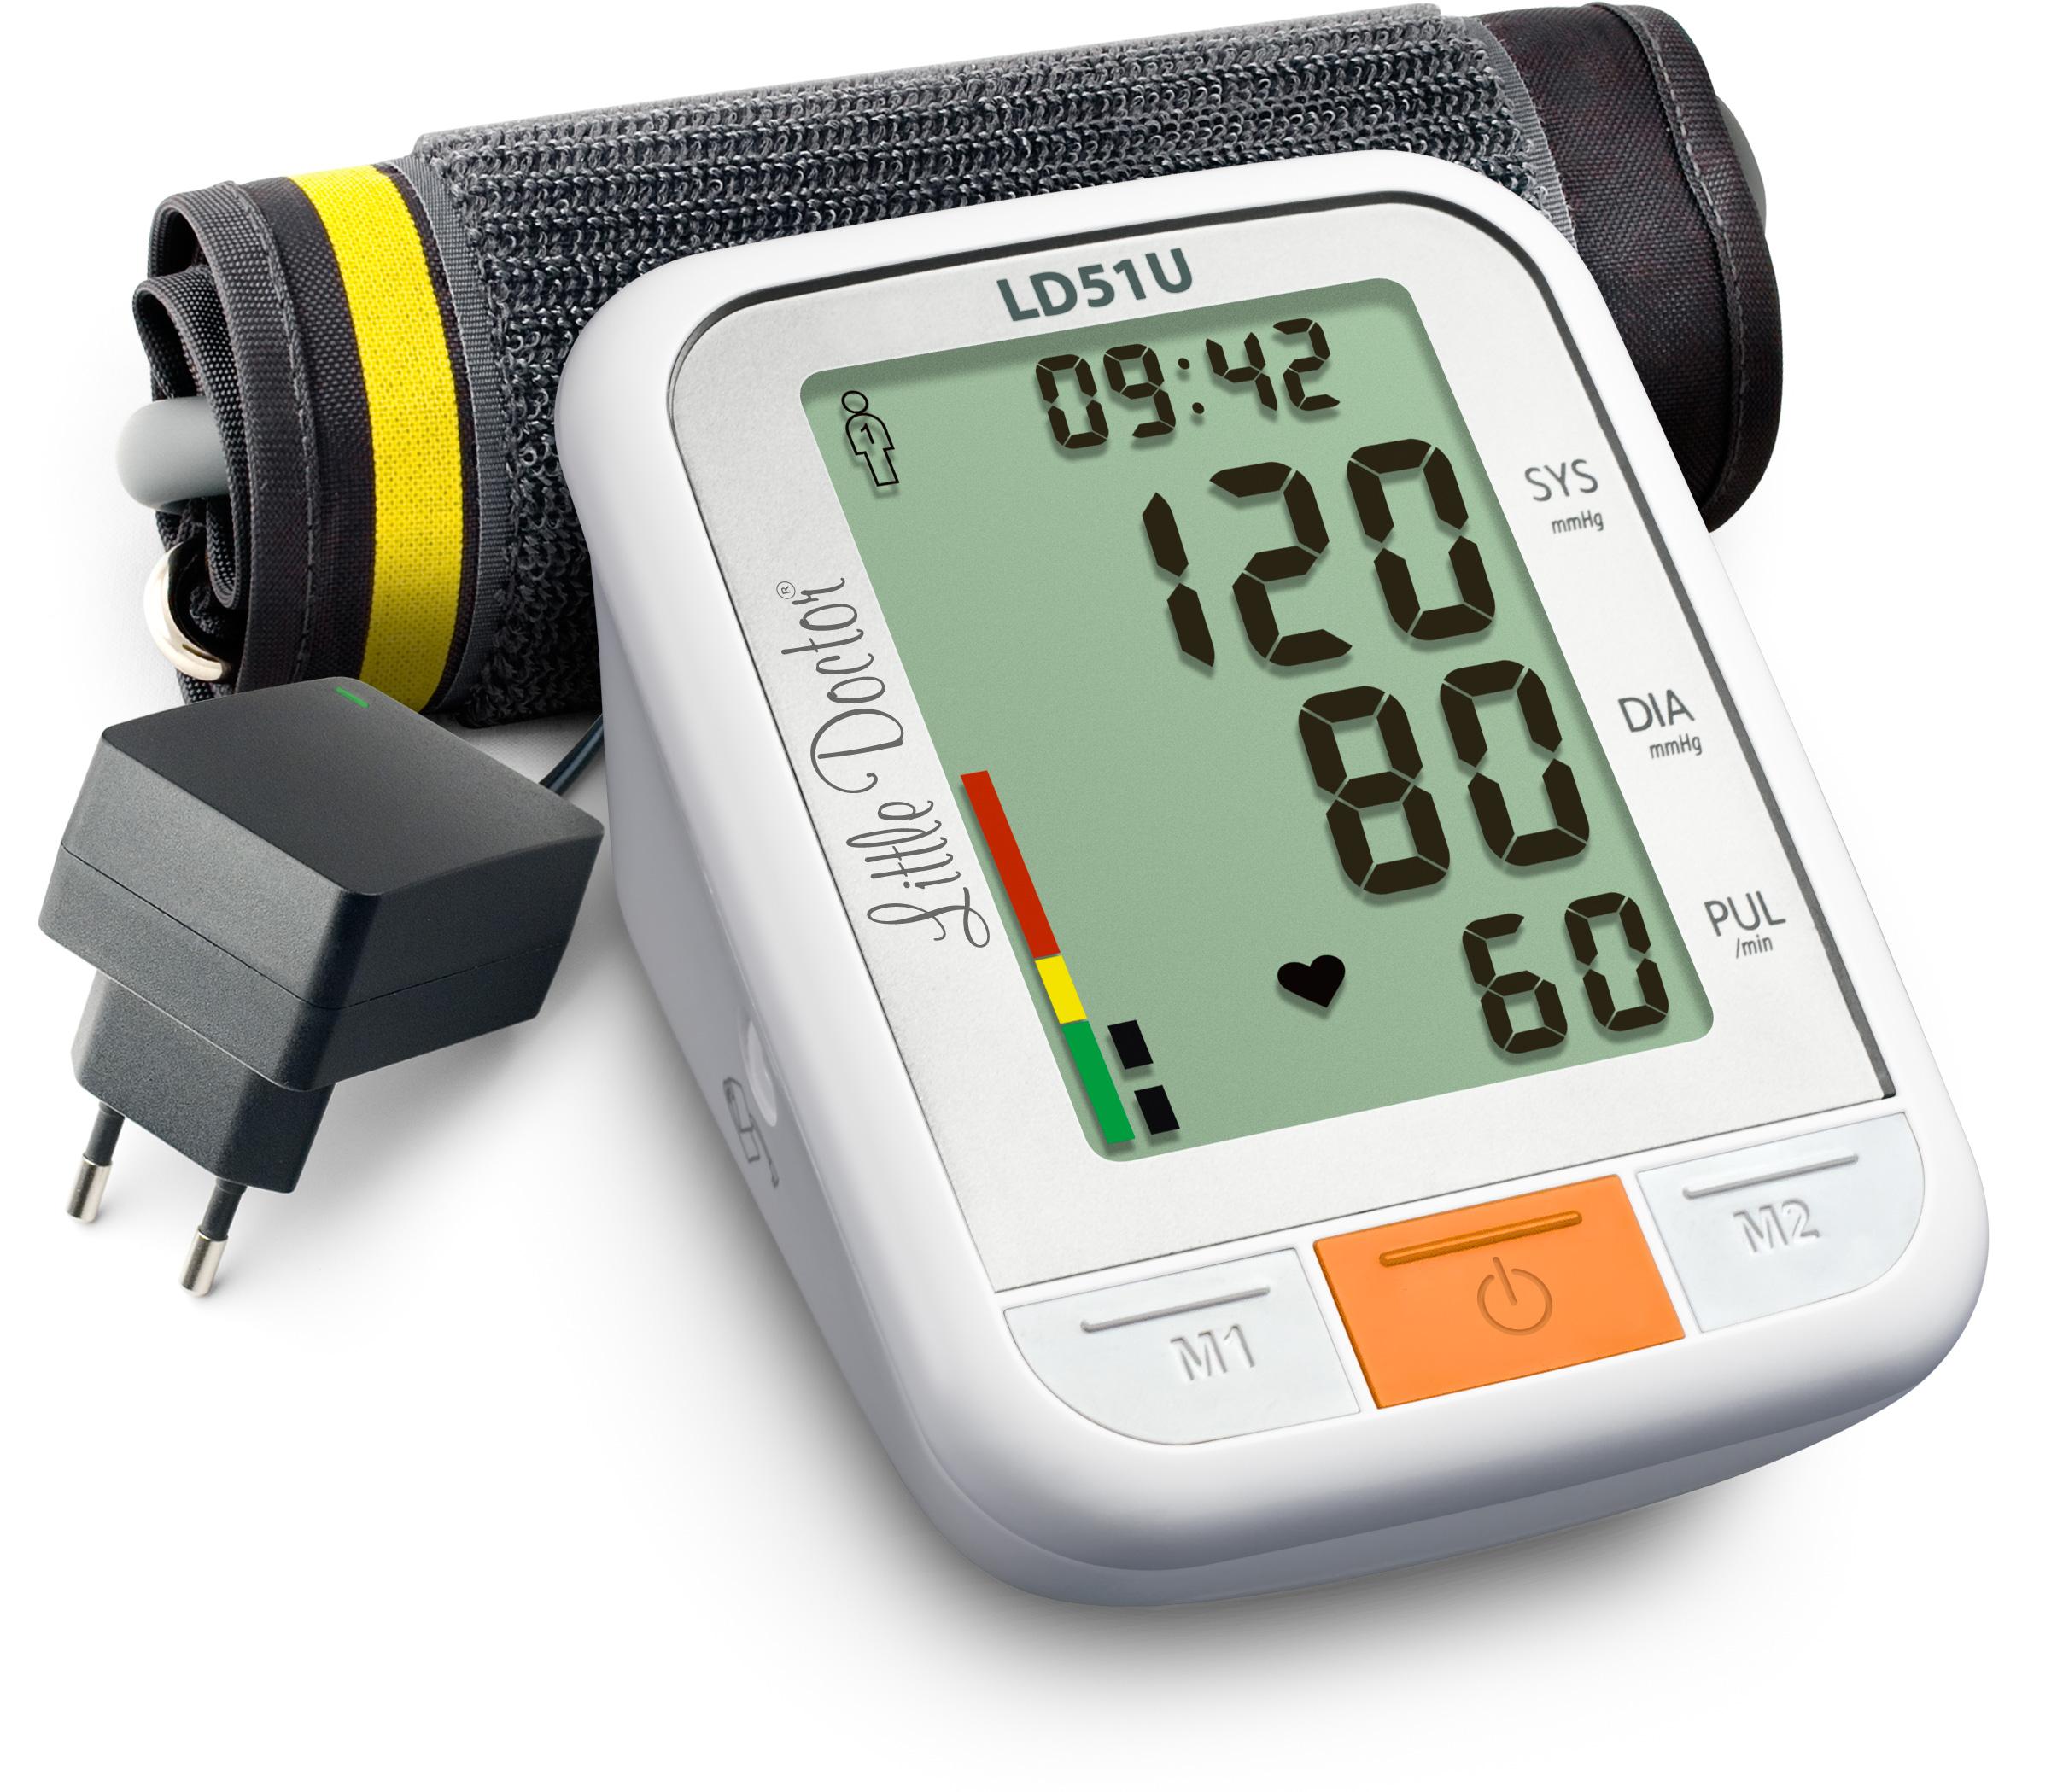 Тонометр Little Doctor LD51U автоматический на плечо с адаптером фото